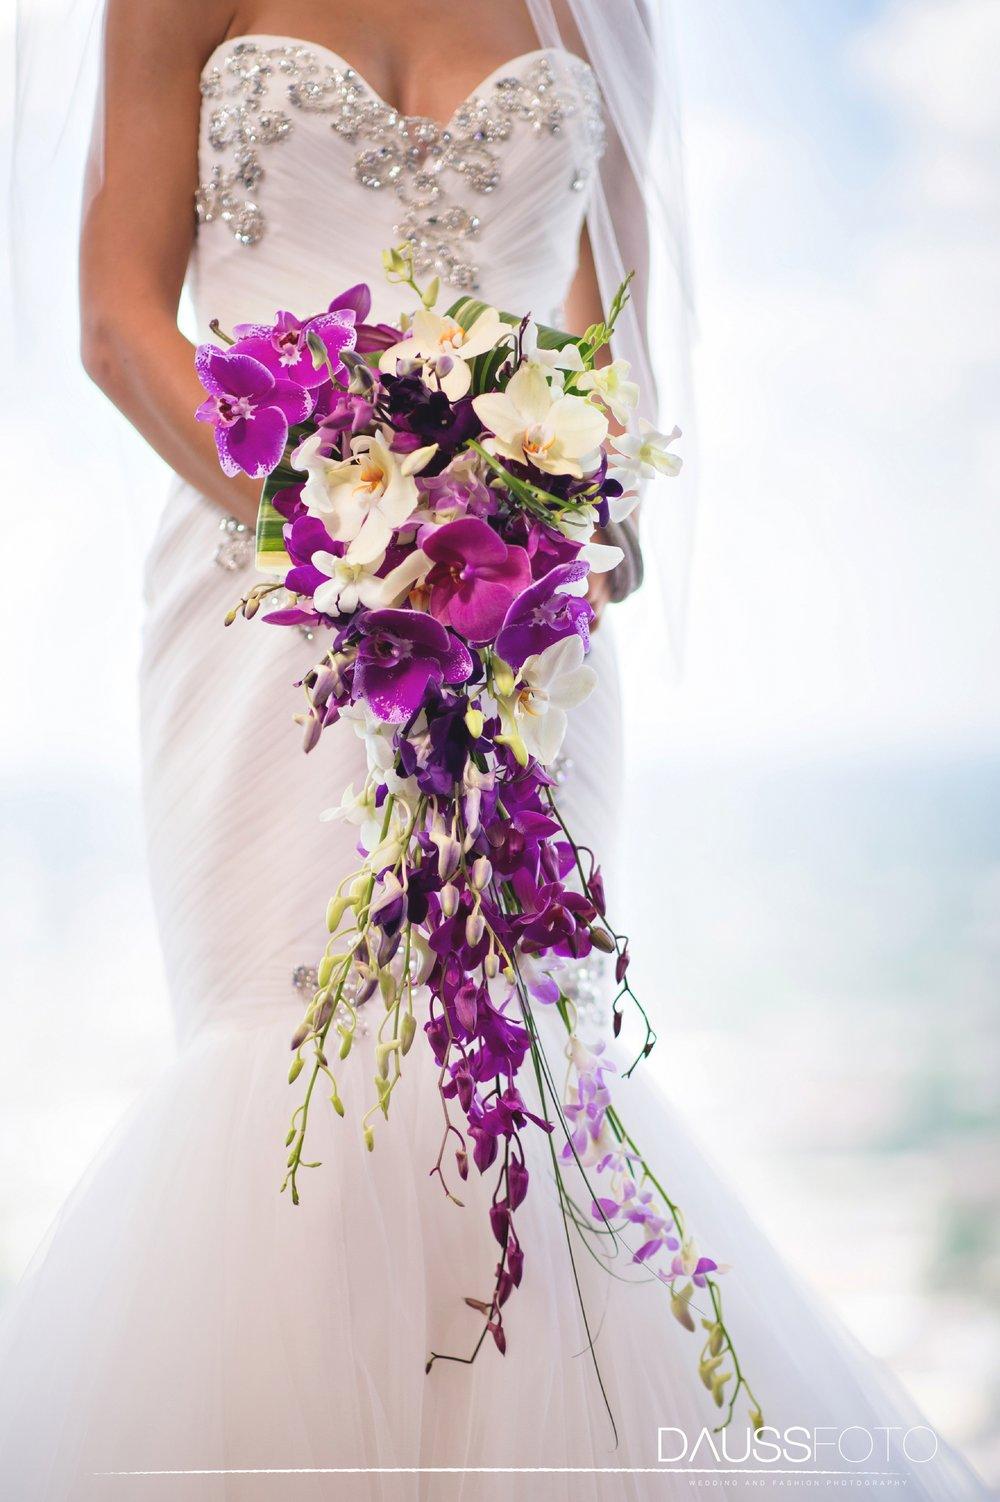 DaussFOTO_20150721_026_Indiana Wedding Photographer.jpg